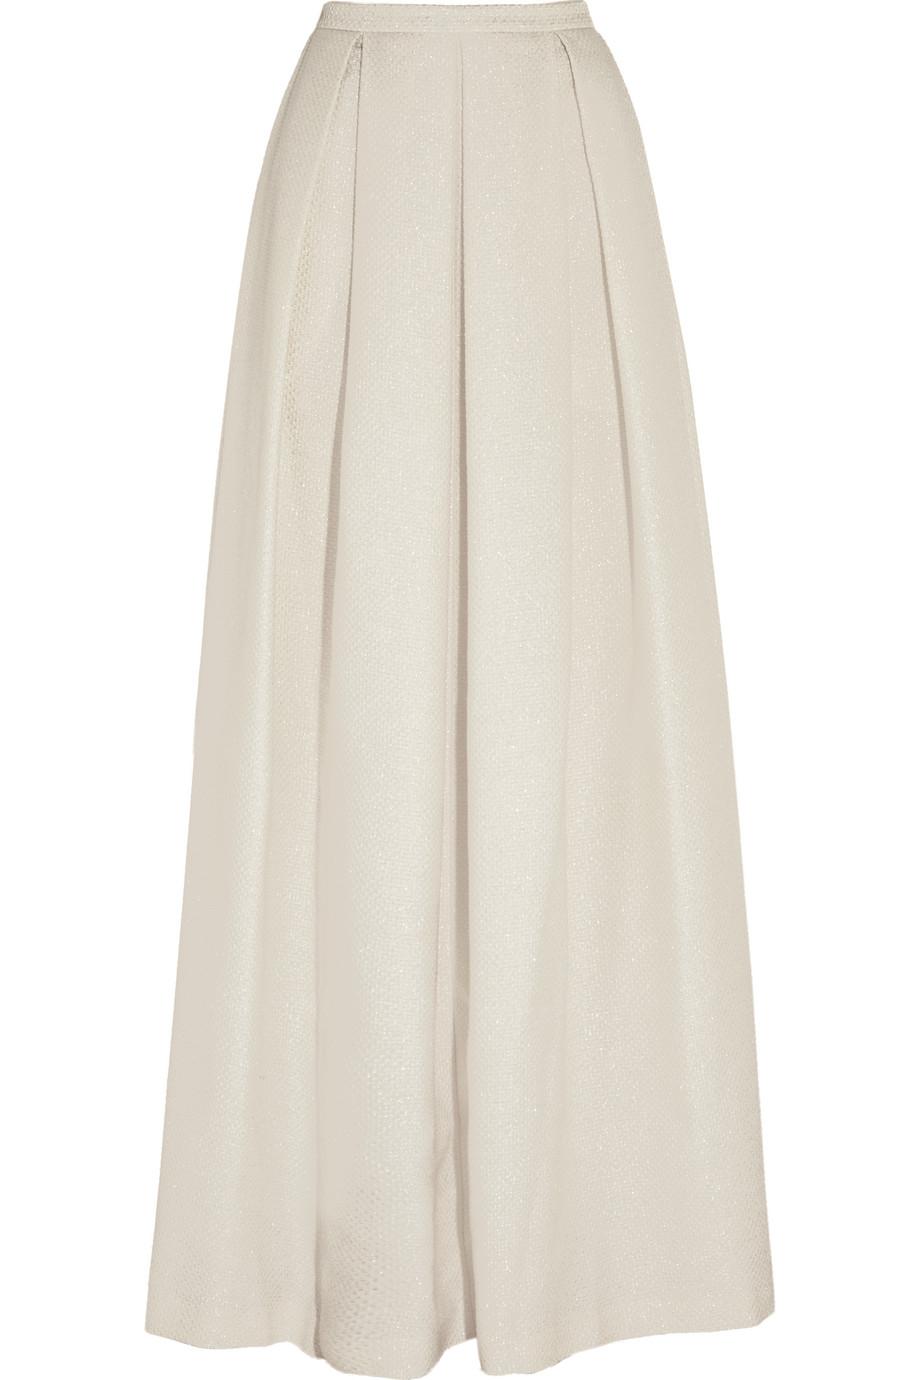 Jenny Packham Pleated Metallic Basketweave Maxi Skirt, Cream, Women's, Size: 8